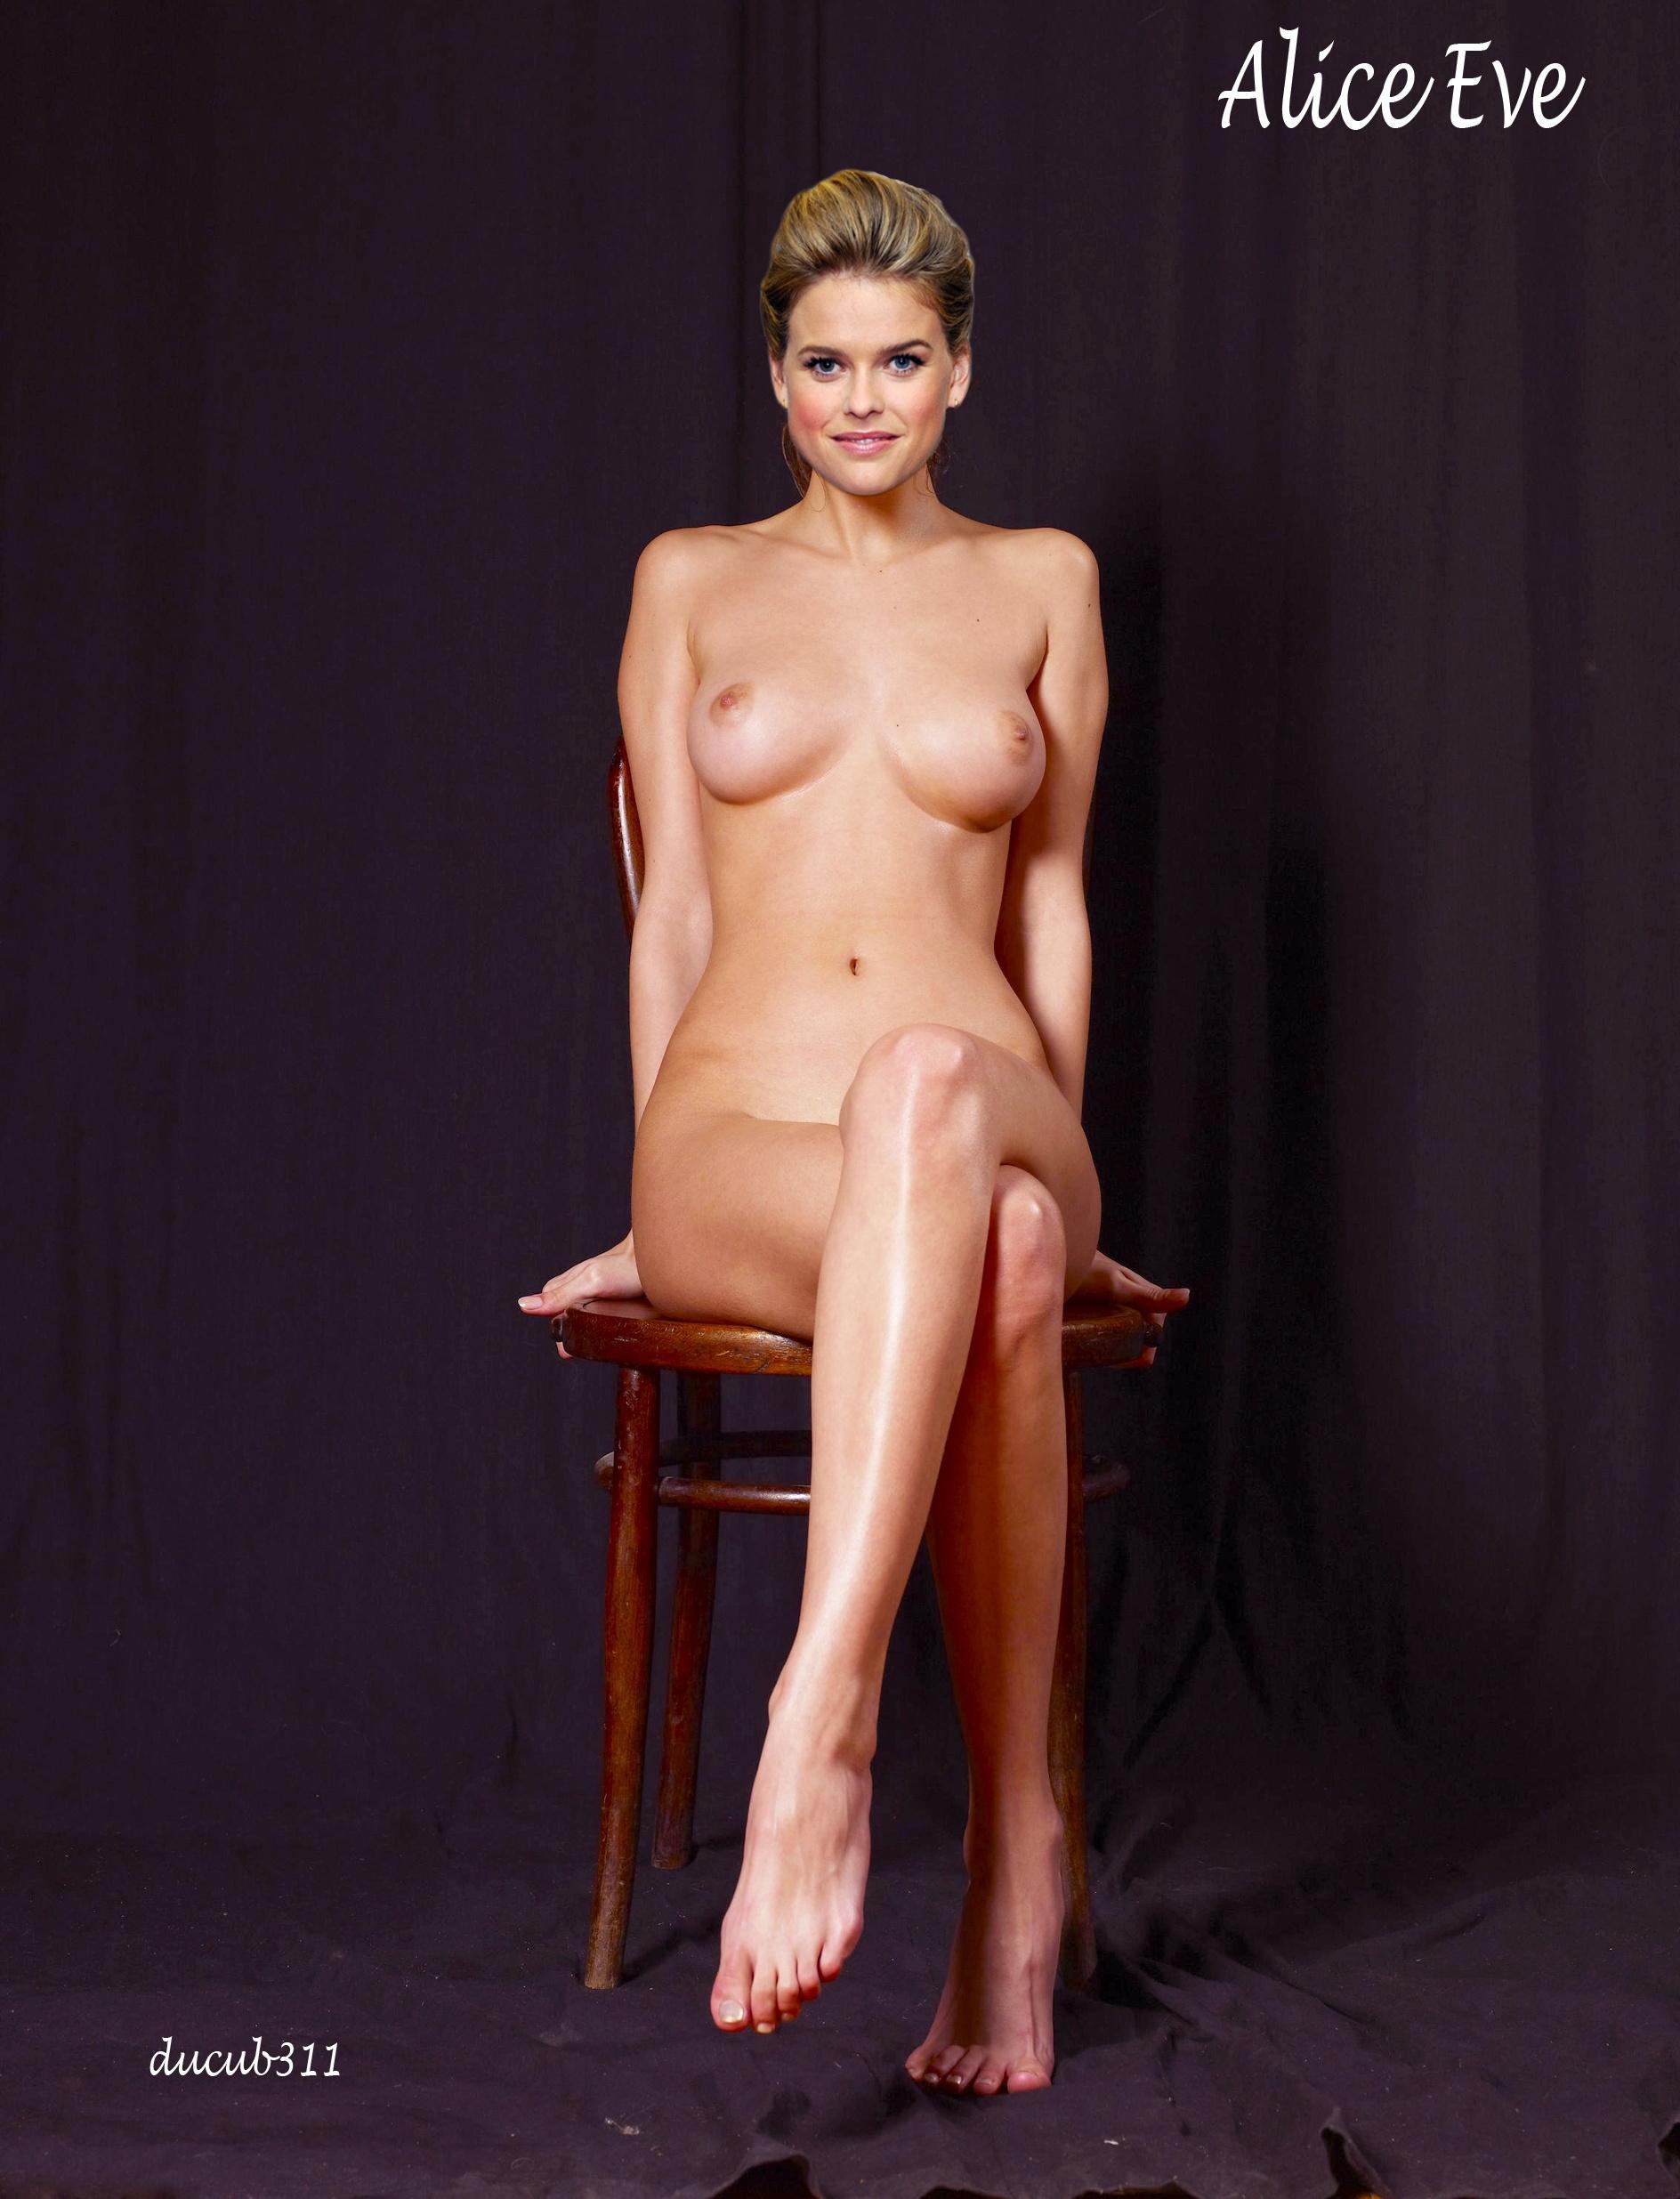 Alice Eve Nude Fake « CelebrityFakes4u.com